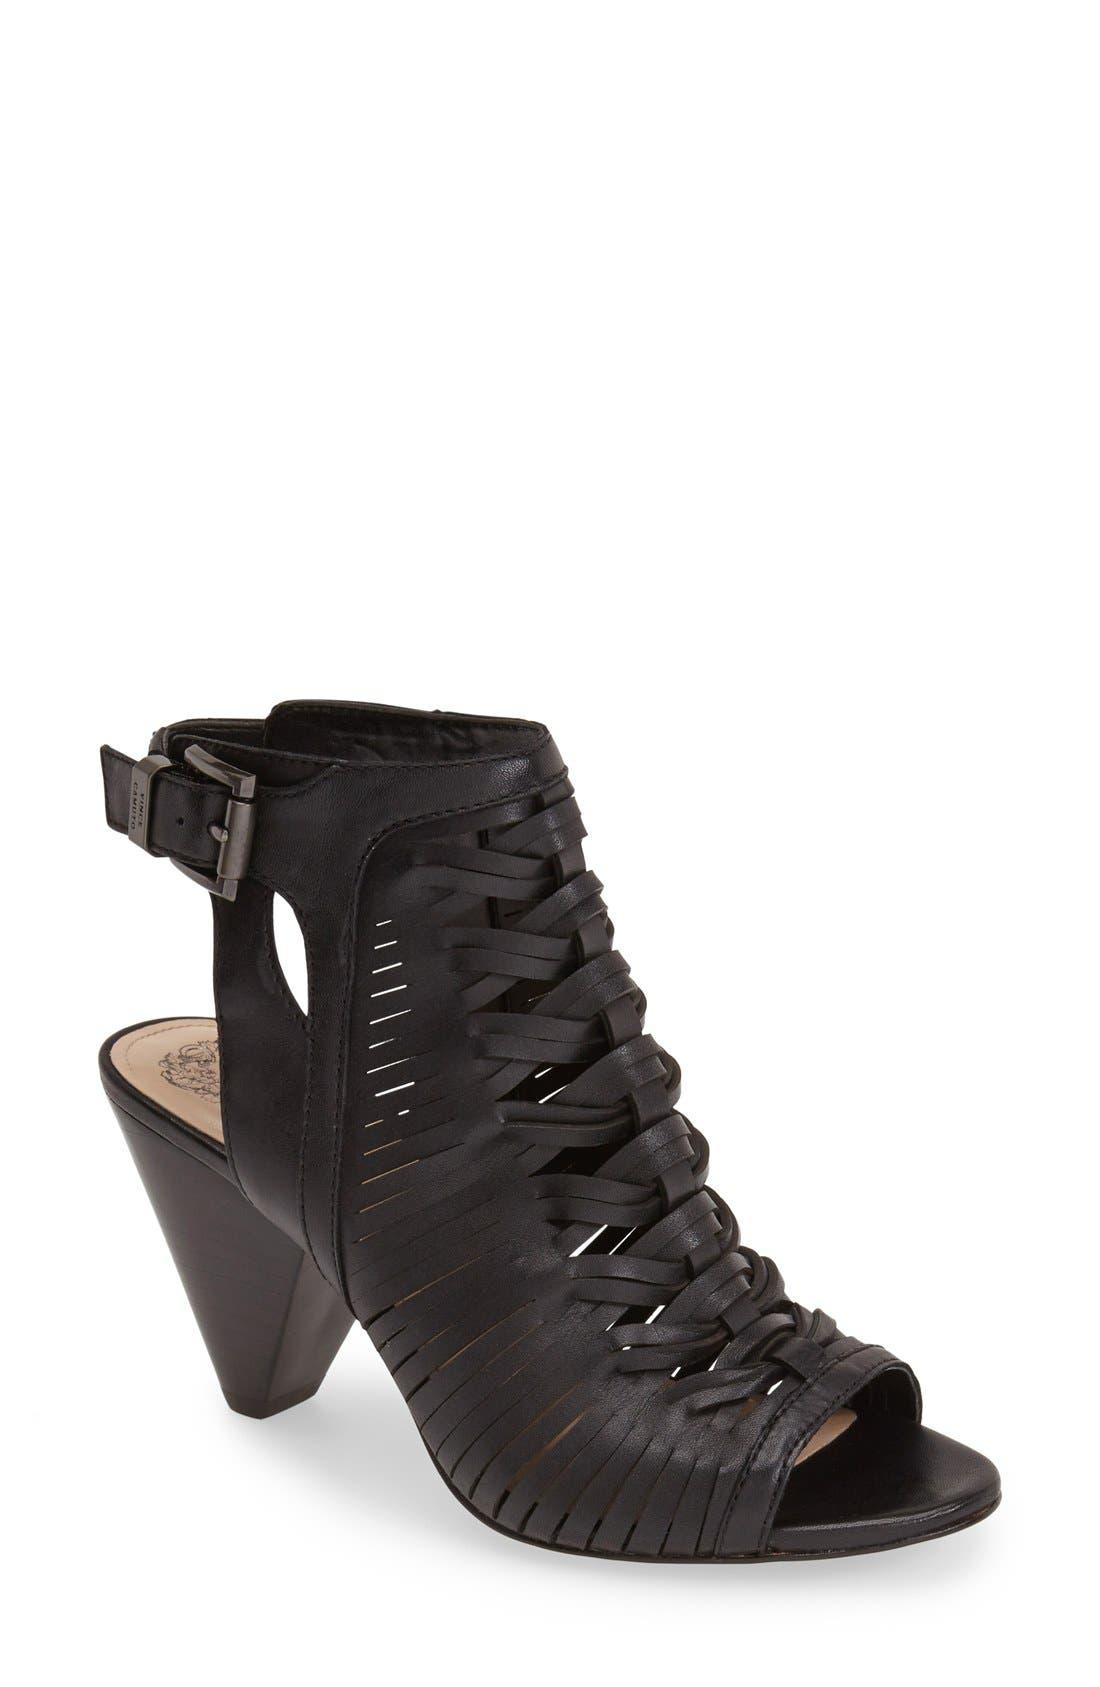 'Emore' Leather Sandal,                             Main thumbnail 1, color,                             001